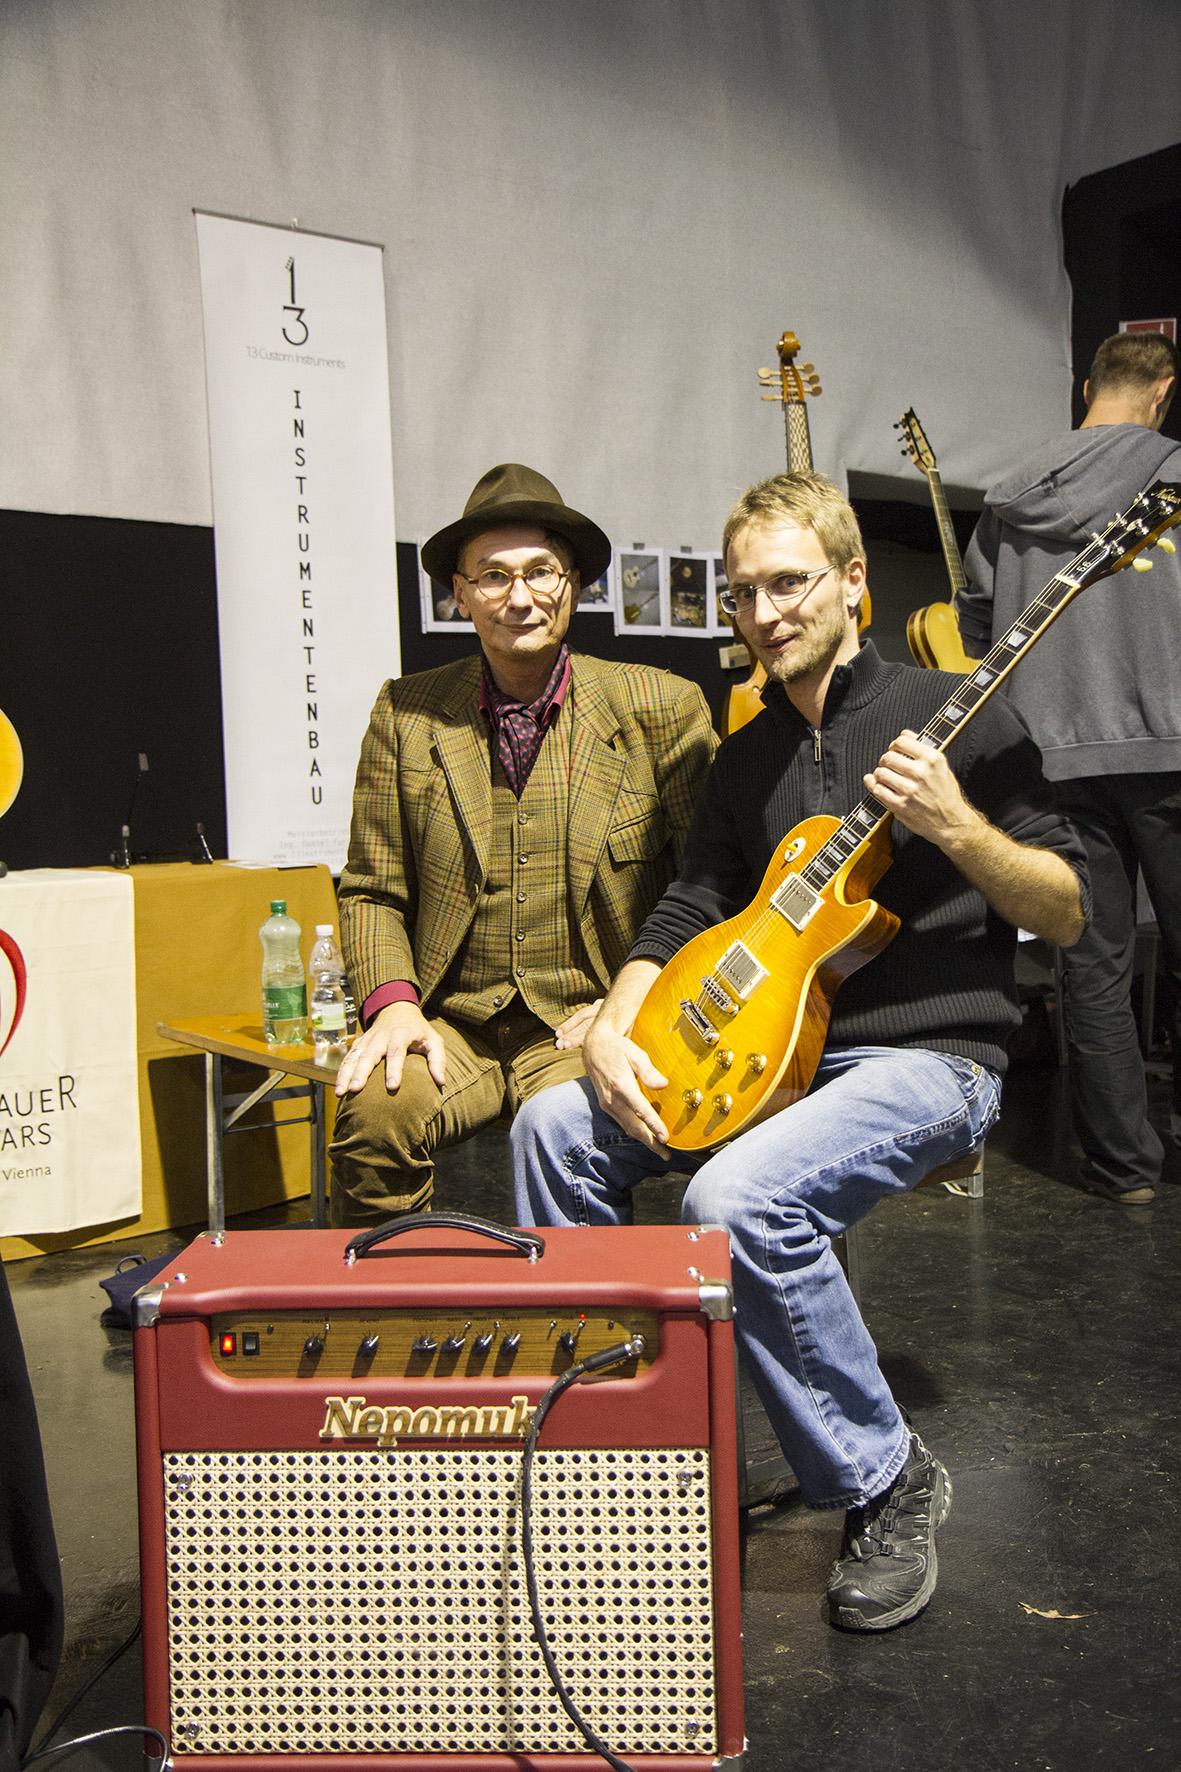 vinyl-festival-linz_171013-1948_0229